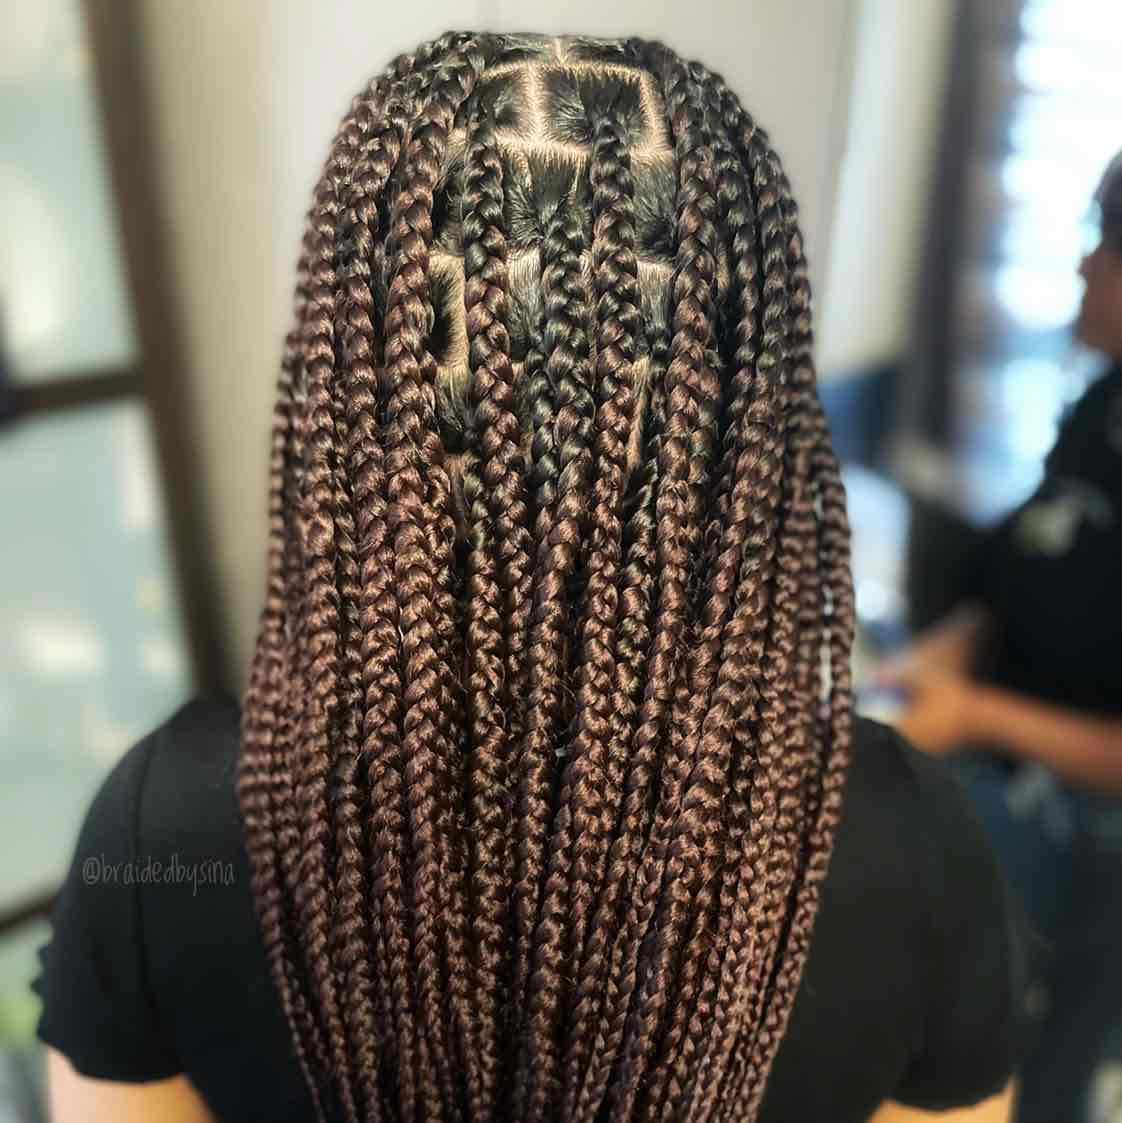 salon de coiffure afro tresse tresses box braids crochet braids vanilles tissages paris 75 77 78 91 92 93 94 95 WZBPFOKL